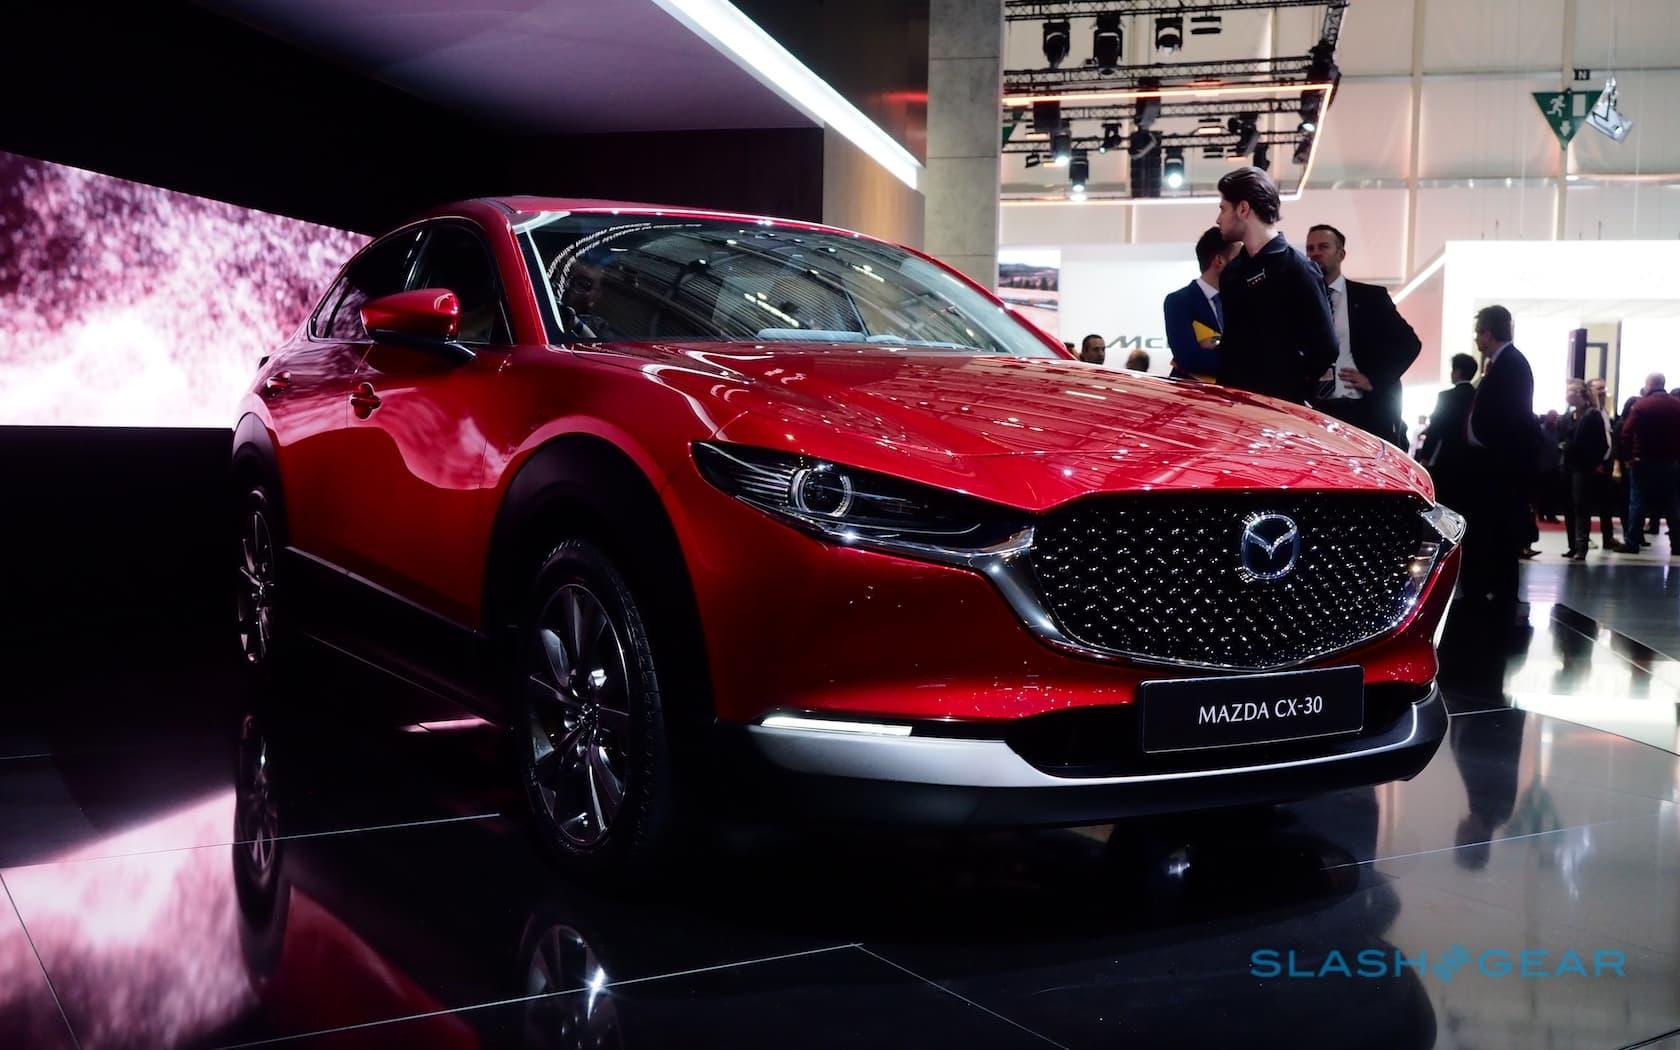 Mazda Cx 3 >> The Mazda CX-30 makes perfect sense (apart from the name) - SlashGear